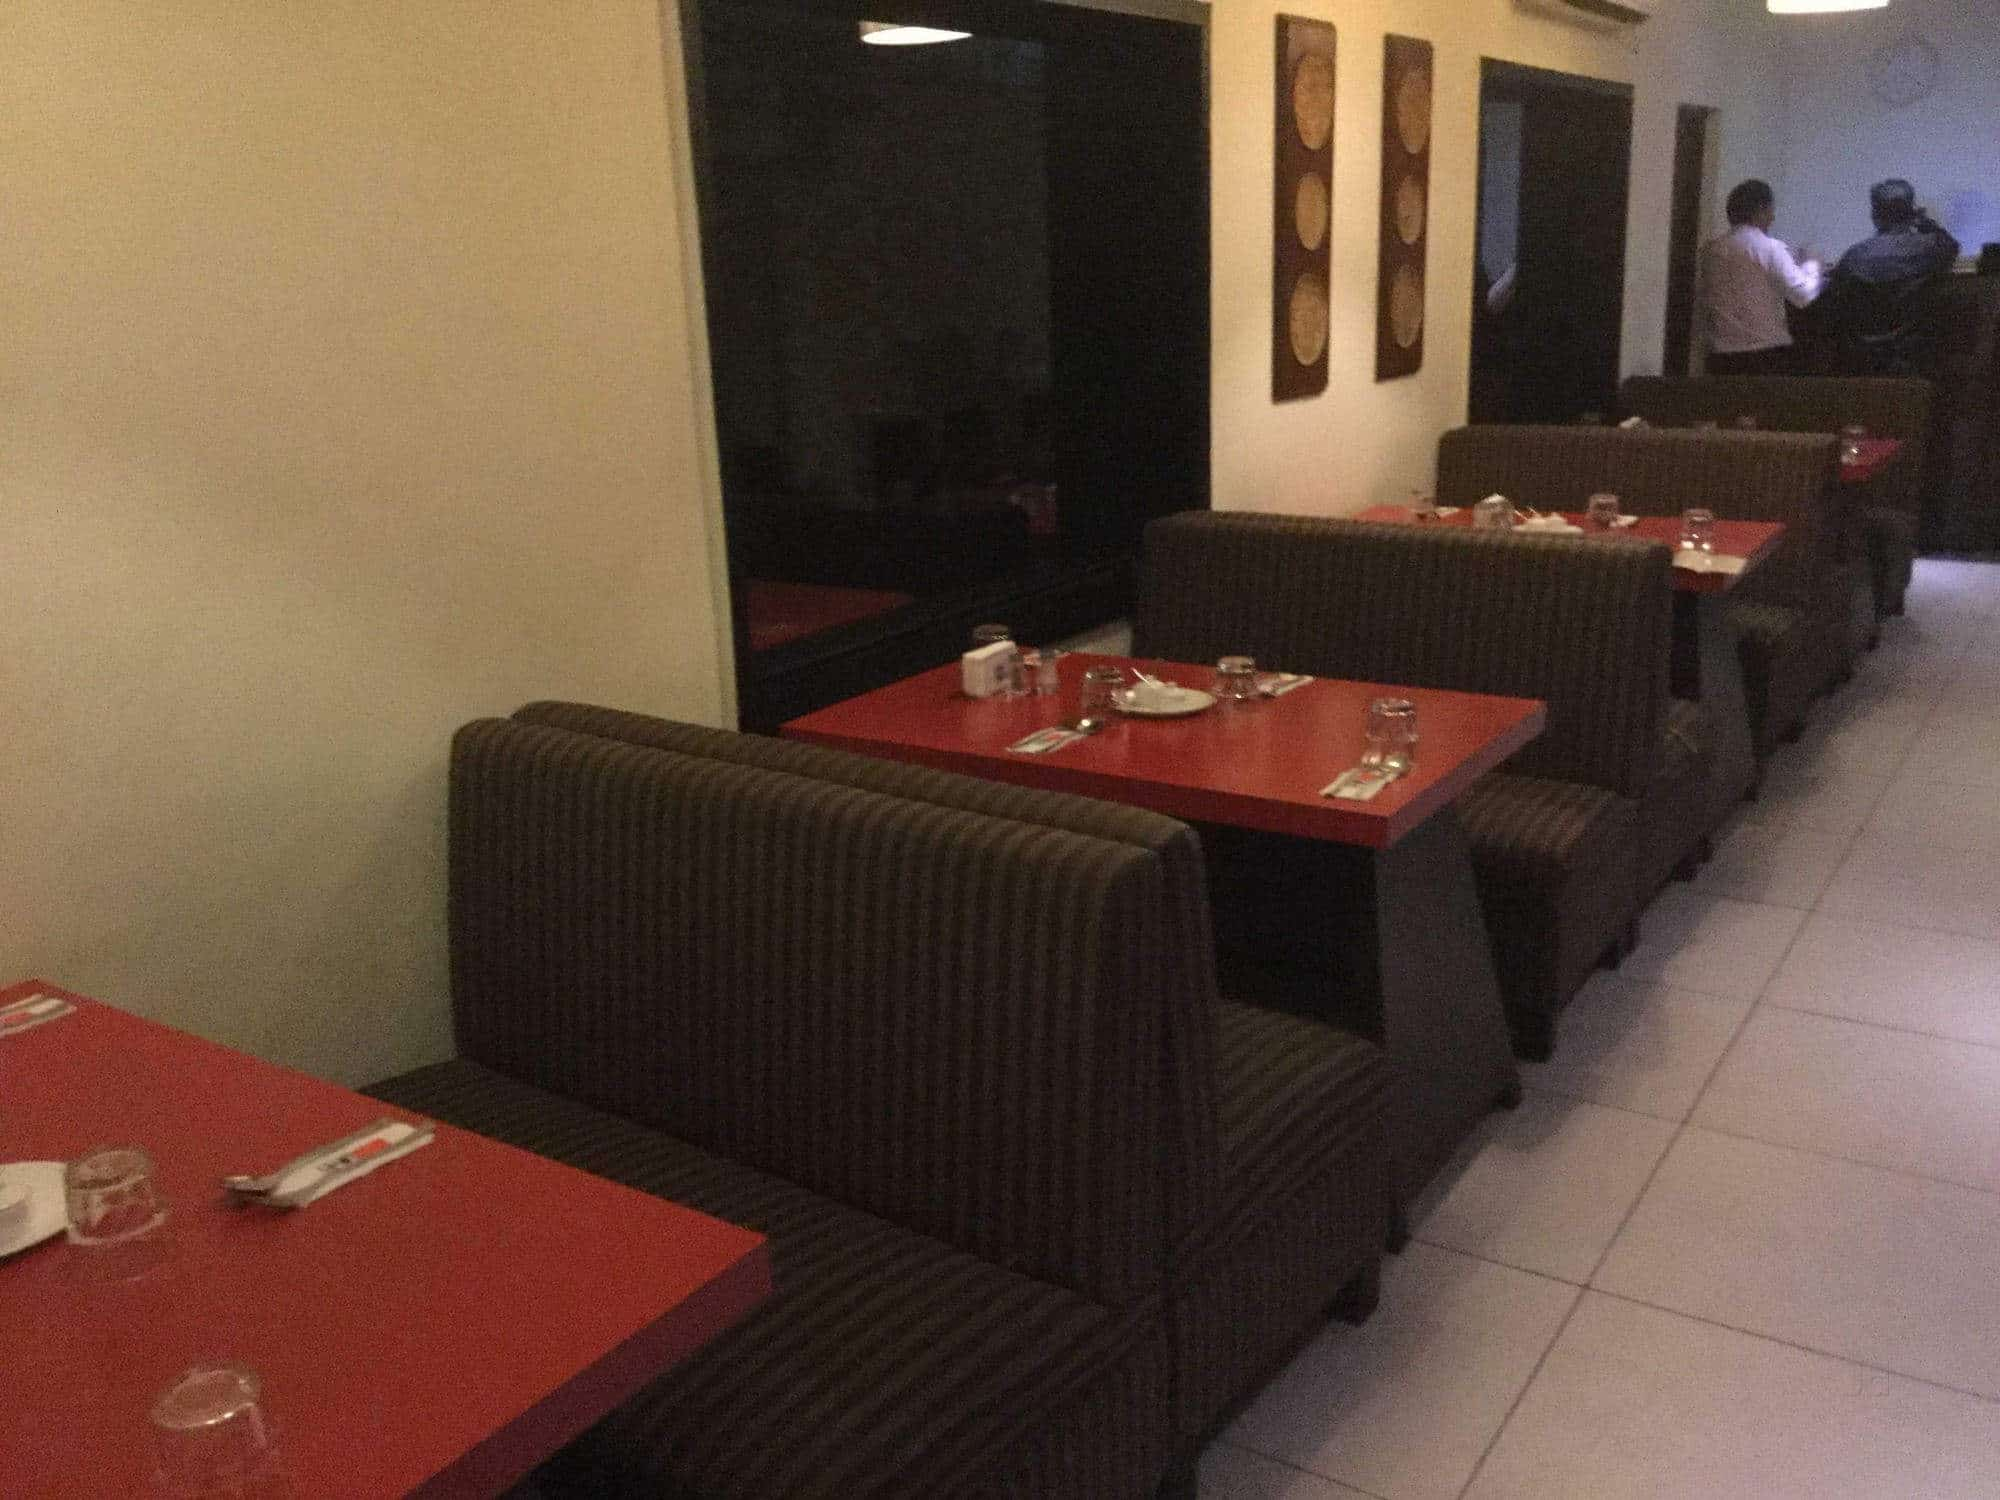 Chung Wah Restaurant Koramangala 5th Block Bangalore Thai Vietnamese Chinese Fast Food Cuisine Restaurant Justdial